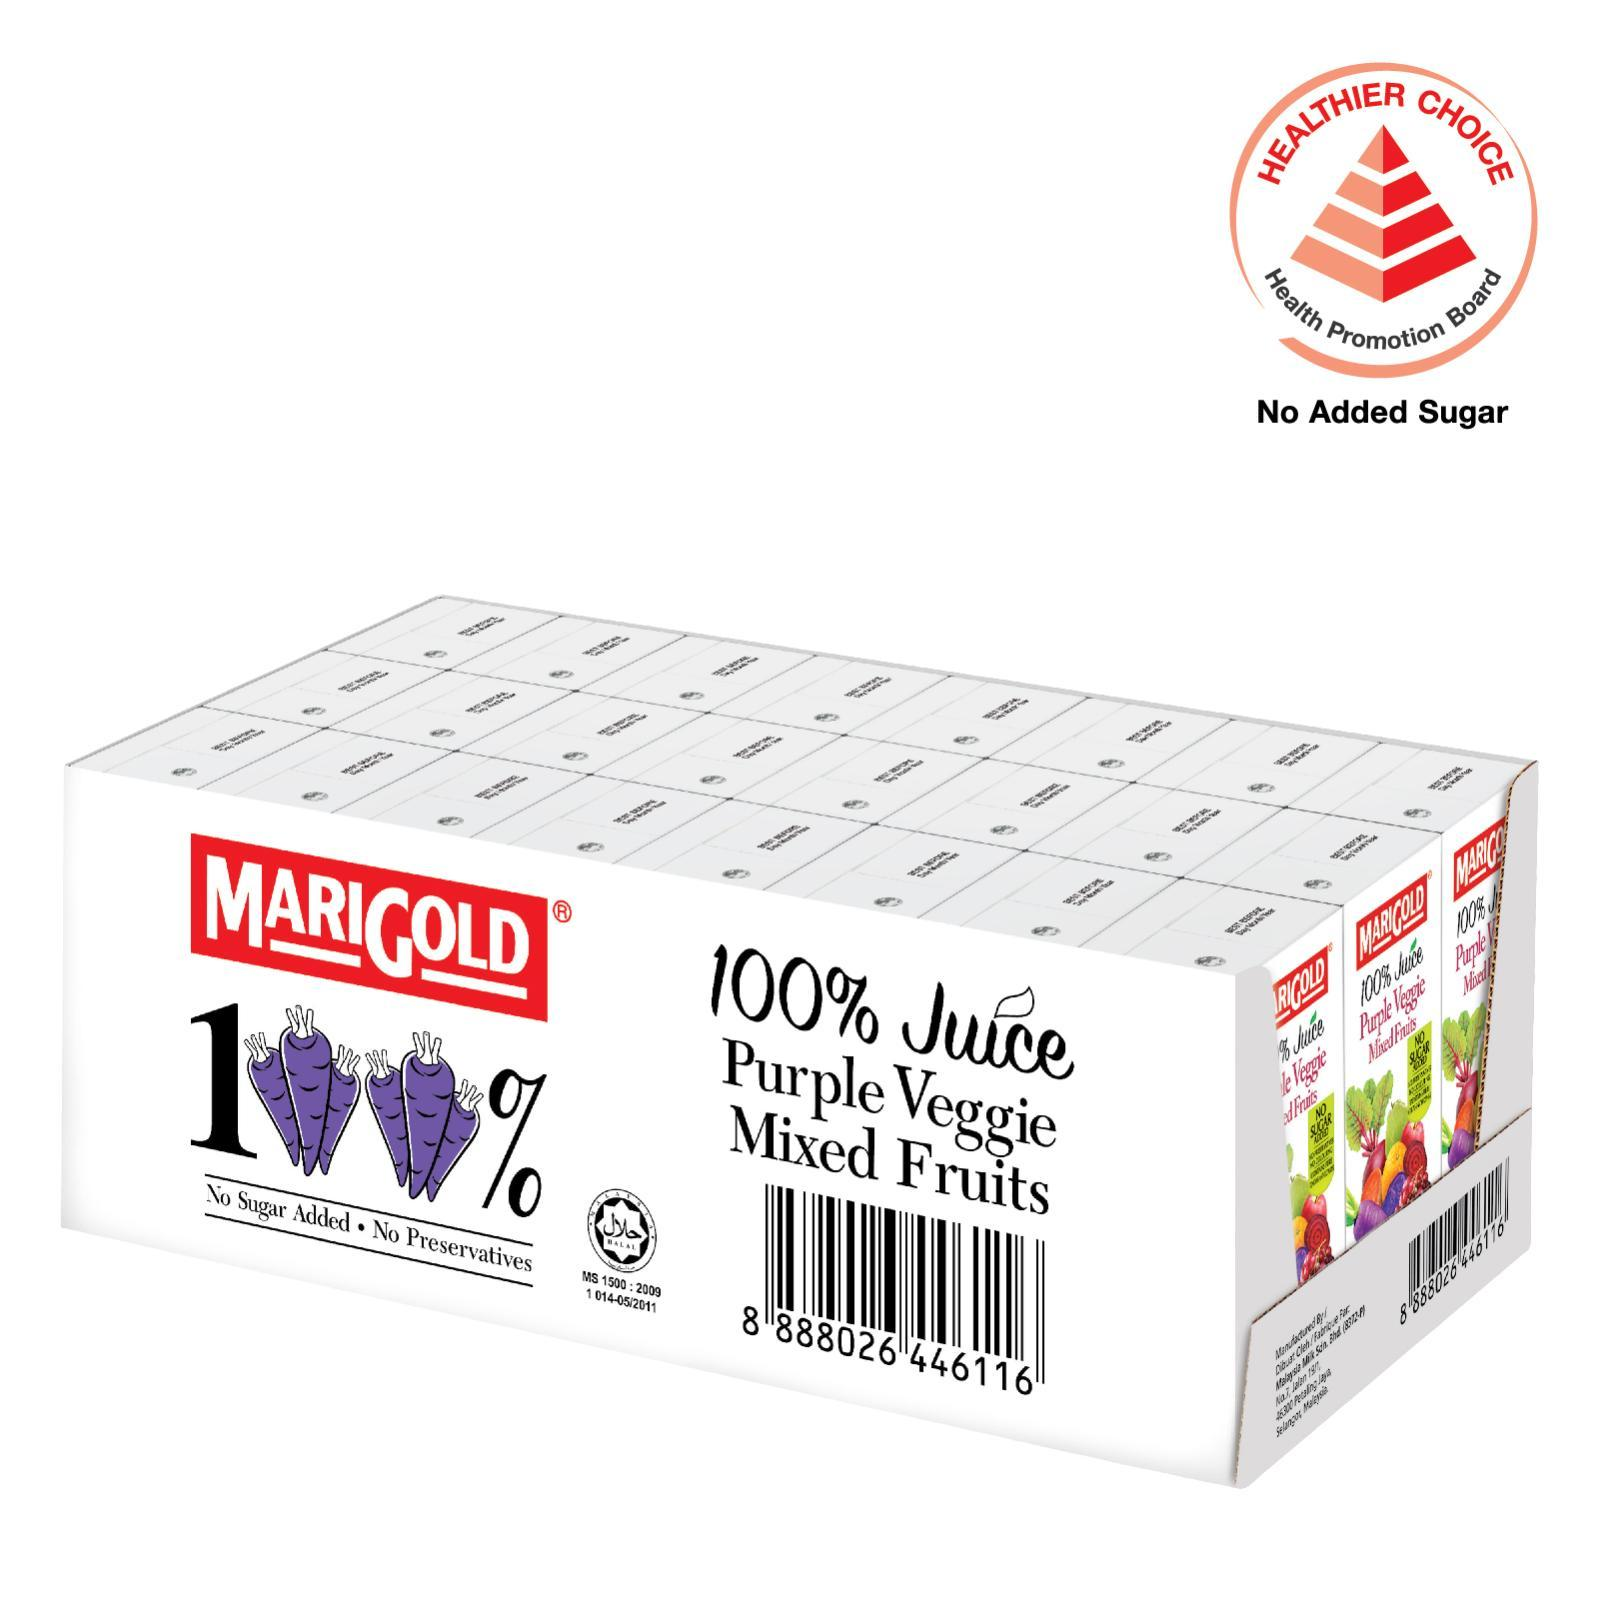 MARIGOLD 100% Purple Veggie Mixed Fruits Juice-Case